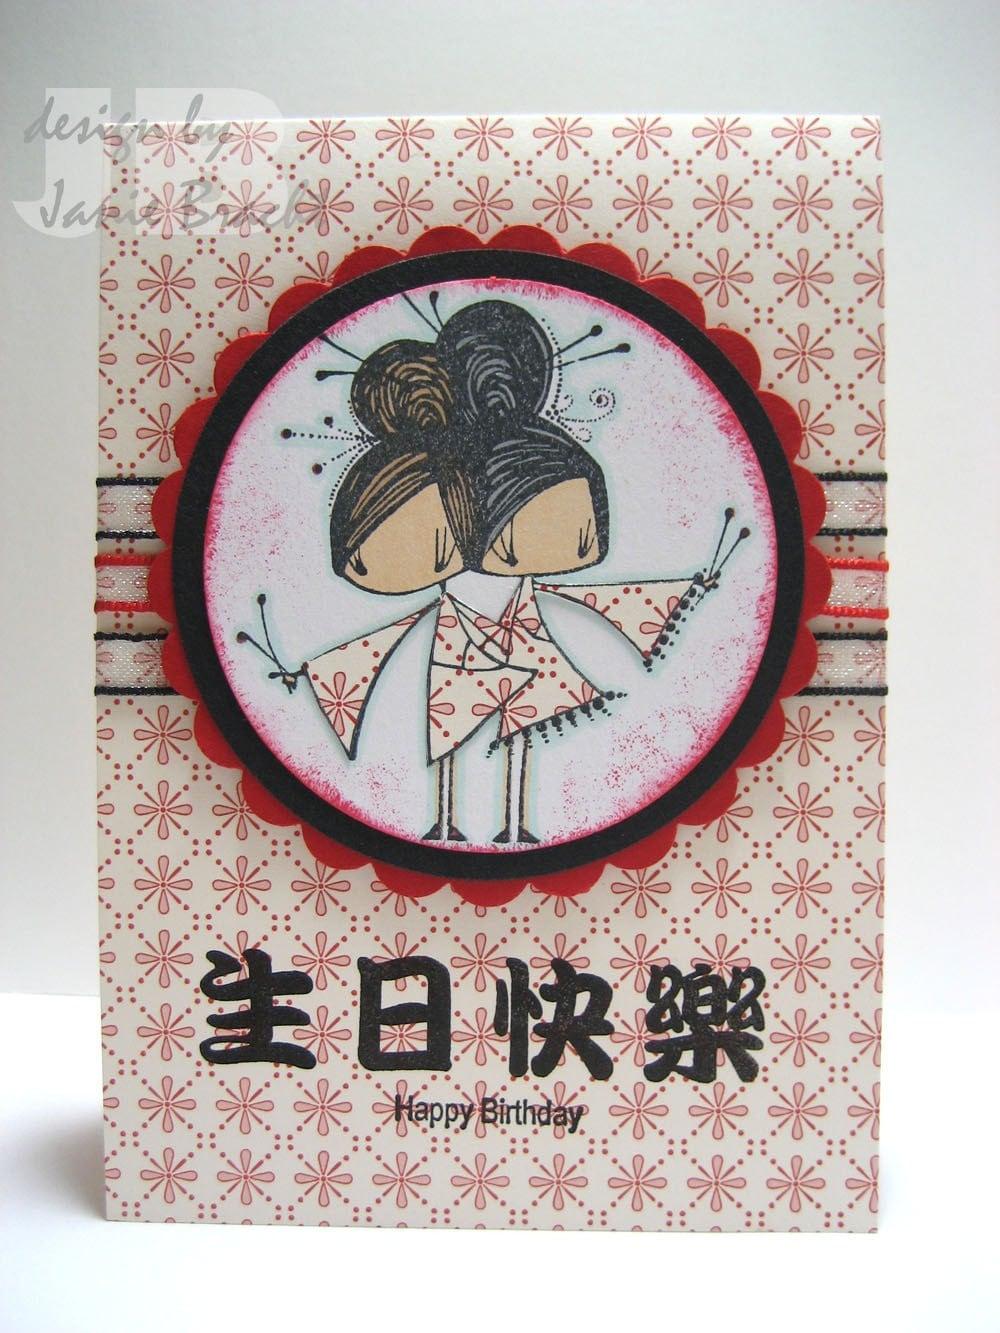 Etsygreetings handmade cards pay it forward happy birthday in pay it forward happy birthday in chinese characters greeting card buycottarizona Gallery